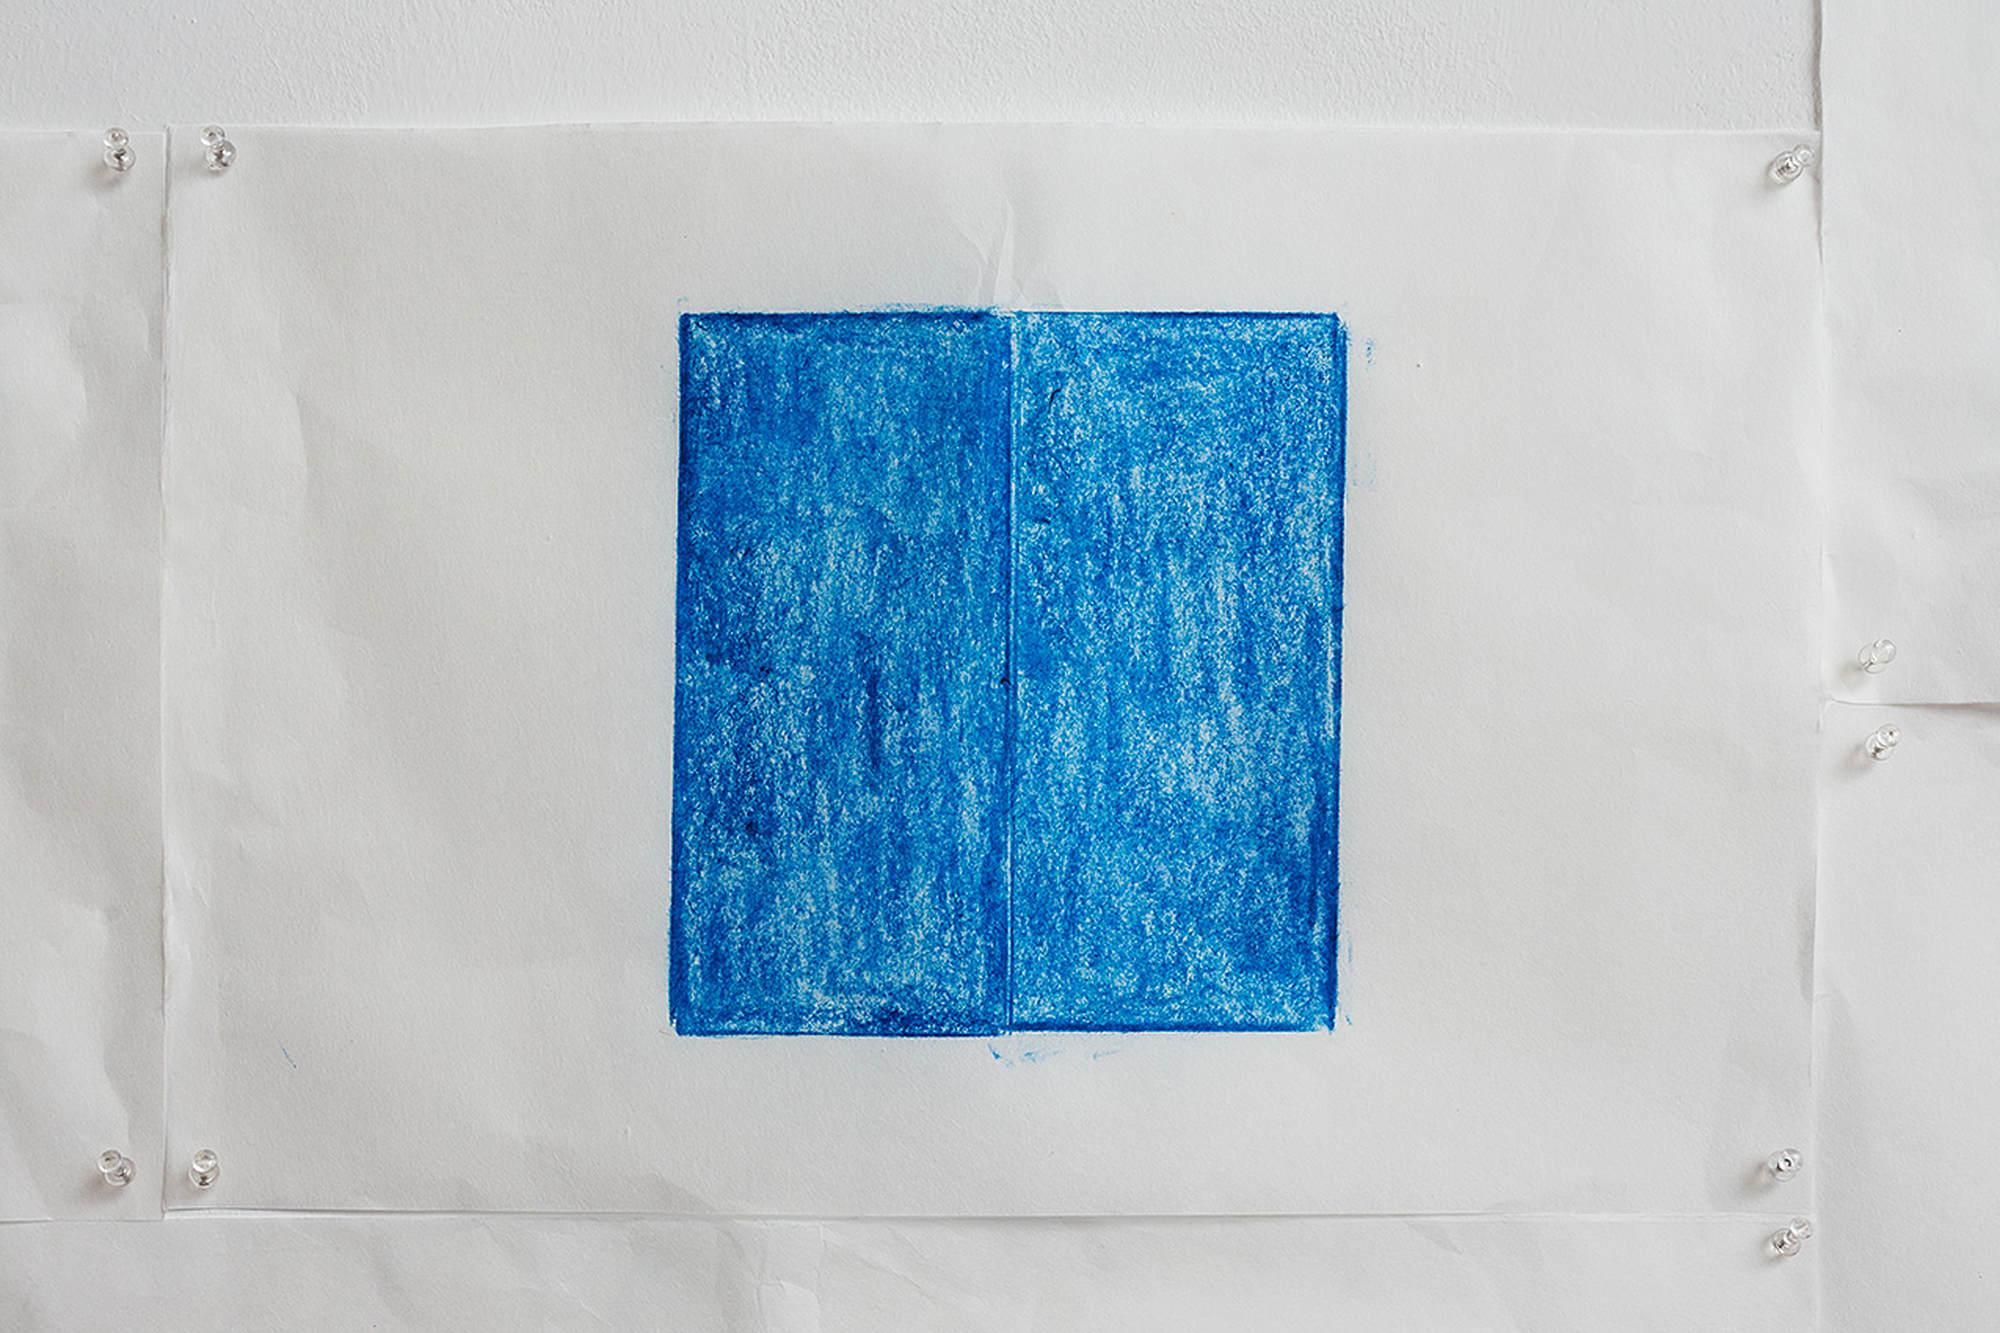 Jennifer Bornstein, Printed Matter, rubbing (encaustic and wax on Kozo paper), 32x49 cm, unique